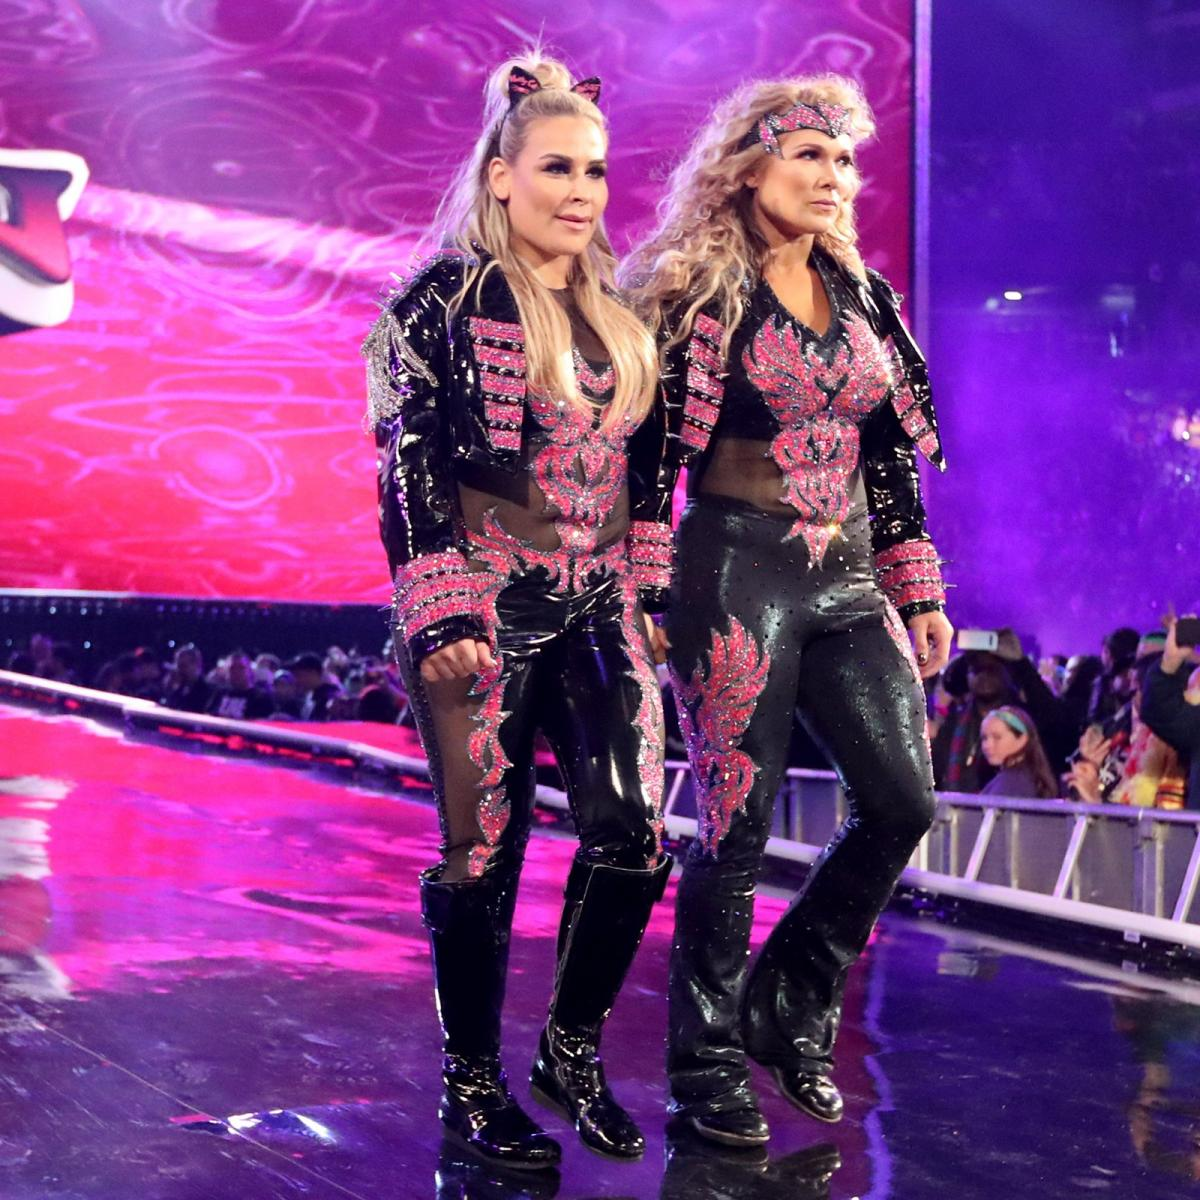 Charlotte Flair vs. Beth Phoenix